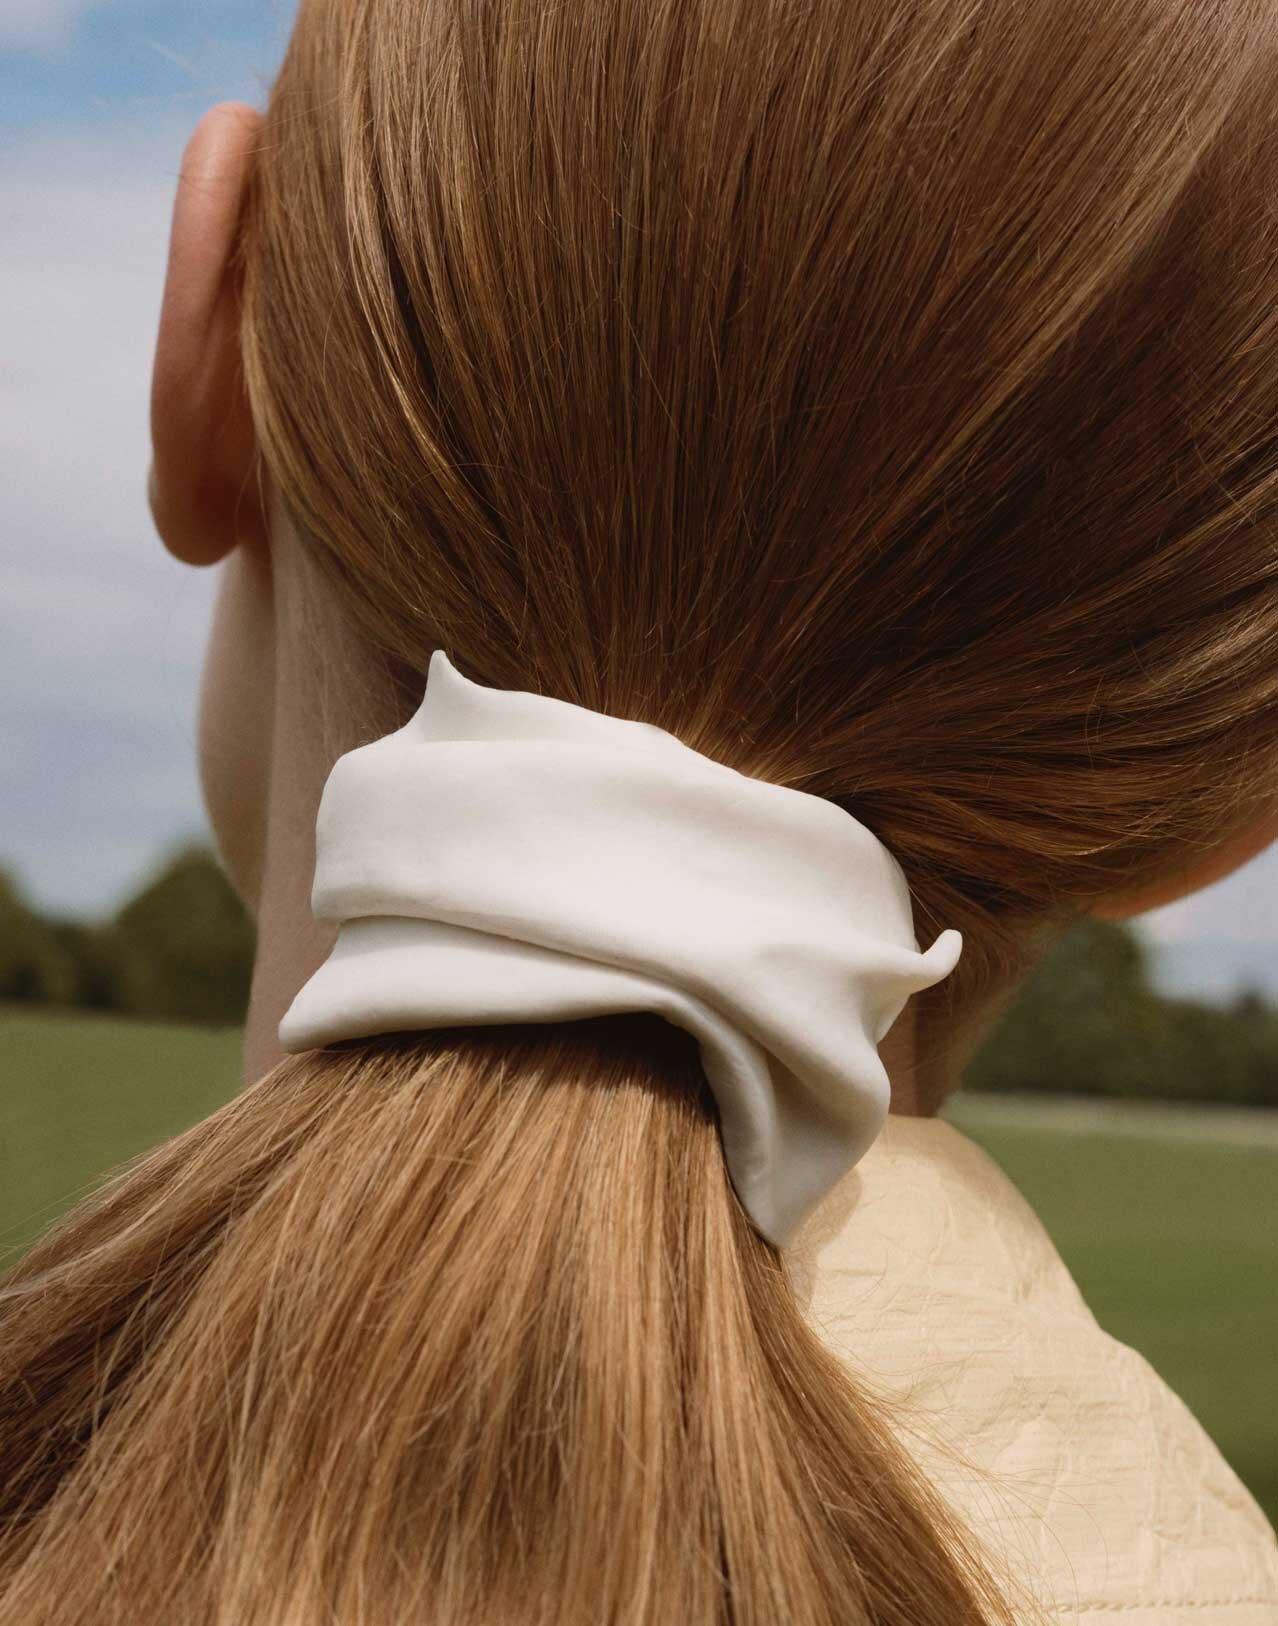 Completedworks-Gold-Vermeil-Hair-Barrette-Poolside-Gossip-10.jpg